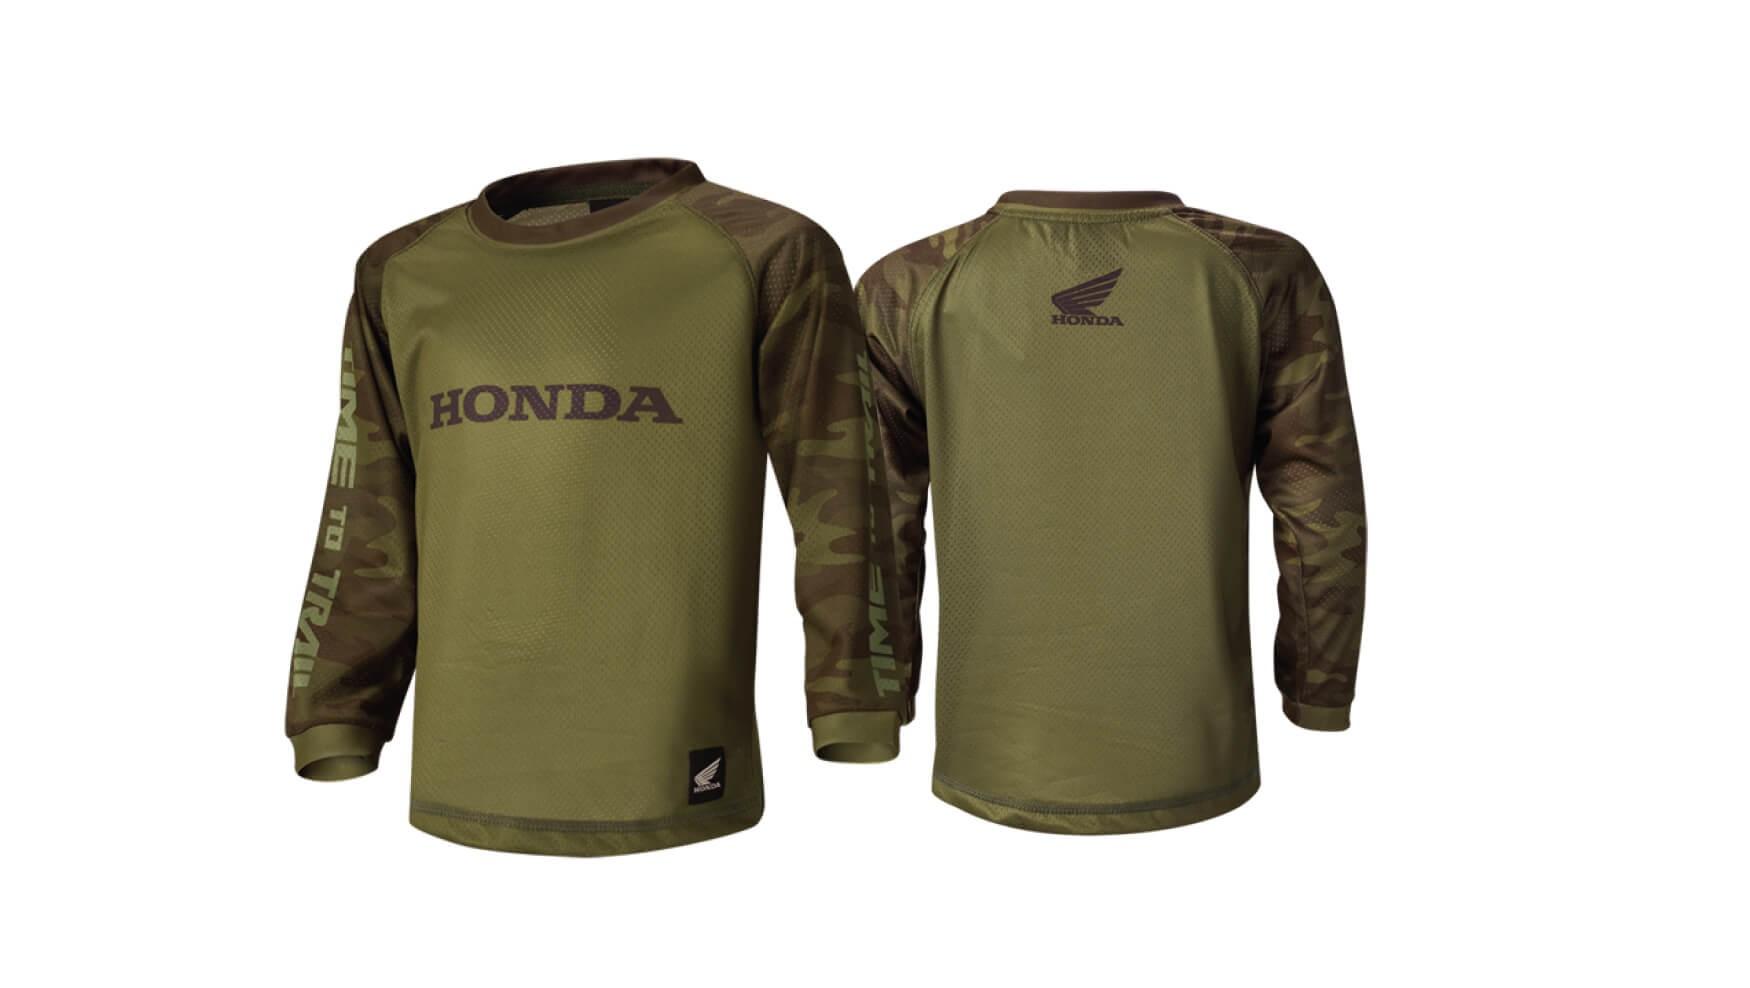 honda-long-sleeve-shirt-kid